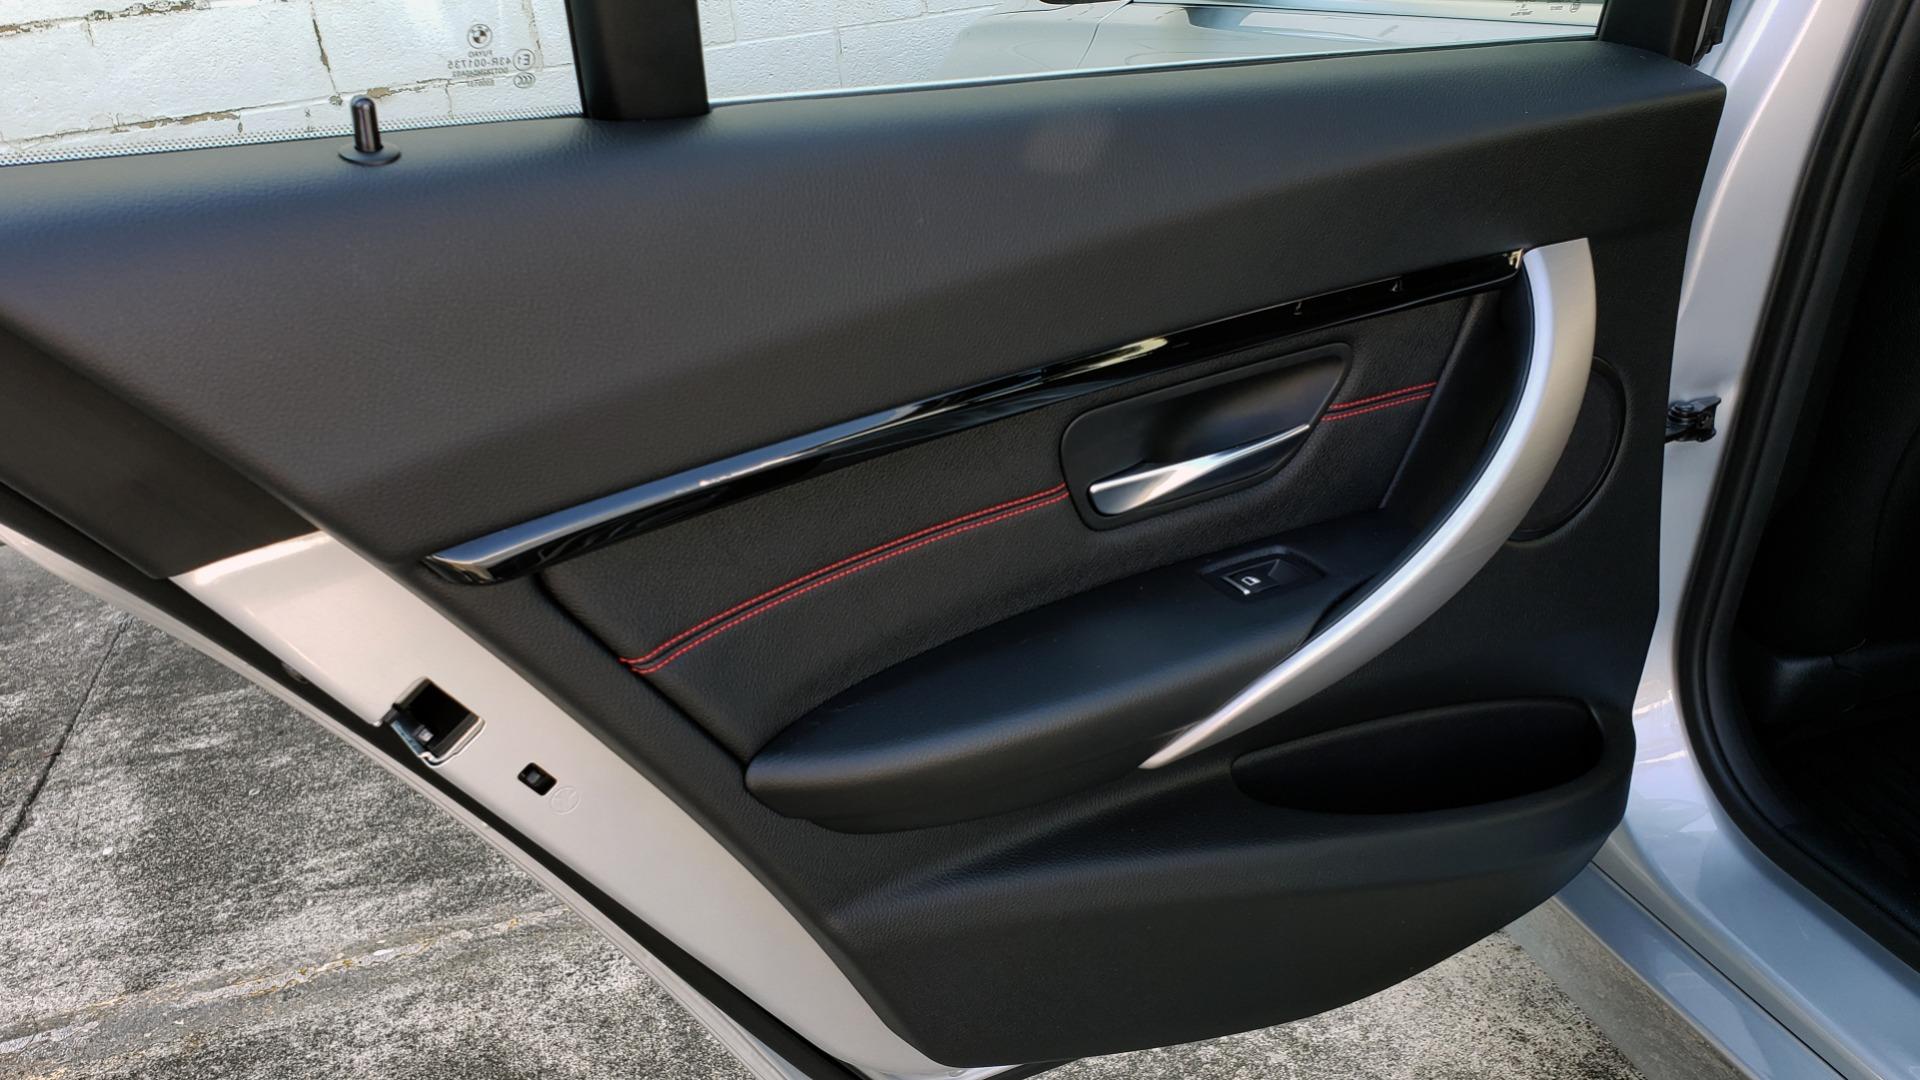 Used 2017 BMW 3 SERIES 330I SPORT SEDAN / DRVR ASST PKG / SUNROOF / REARVIEW for sale Sold at Formula Imports in Charlotte NC 28227 57